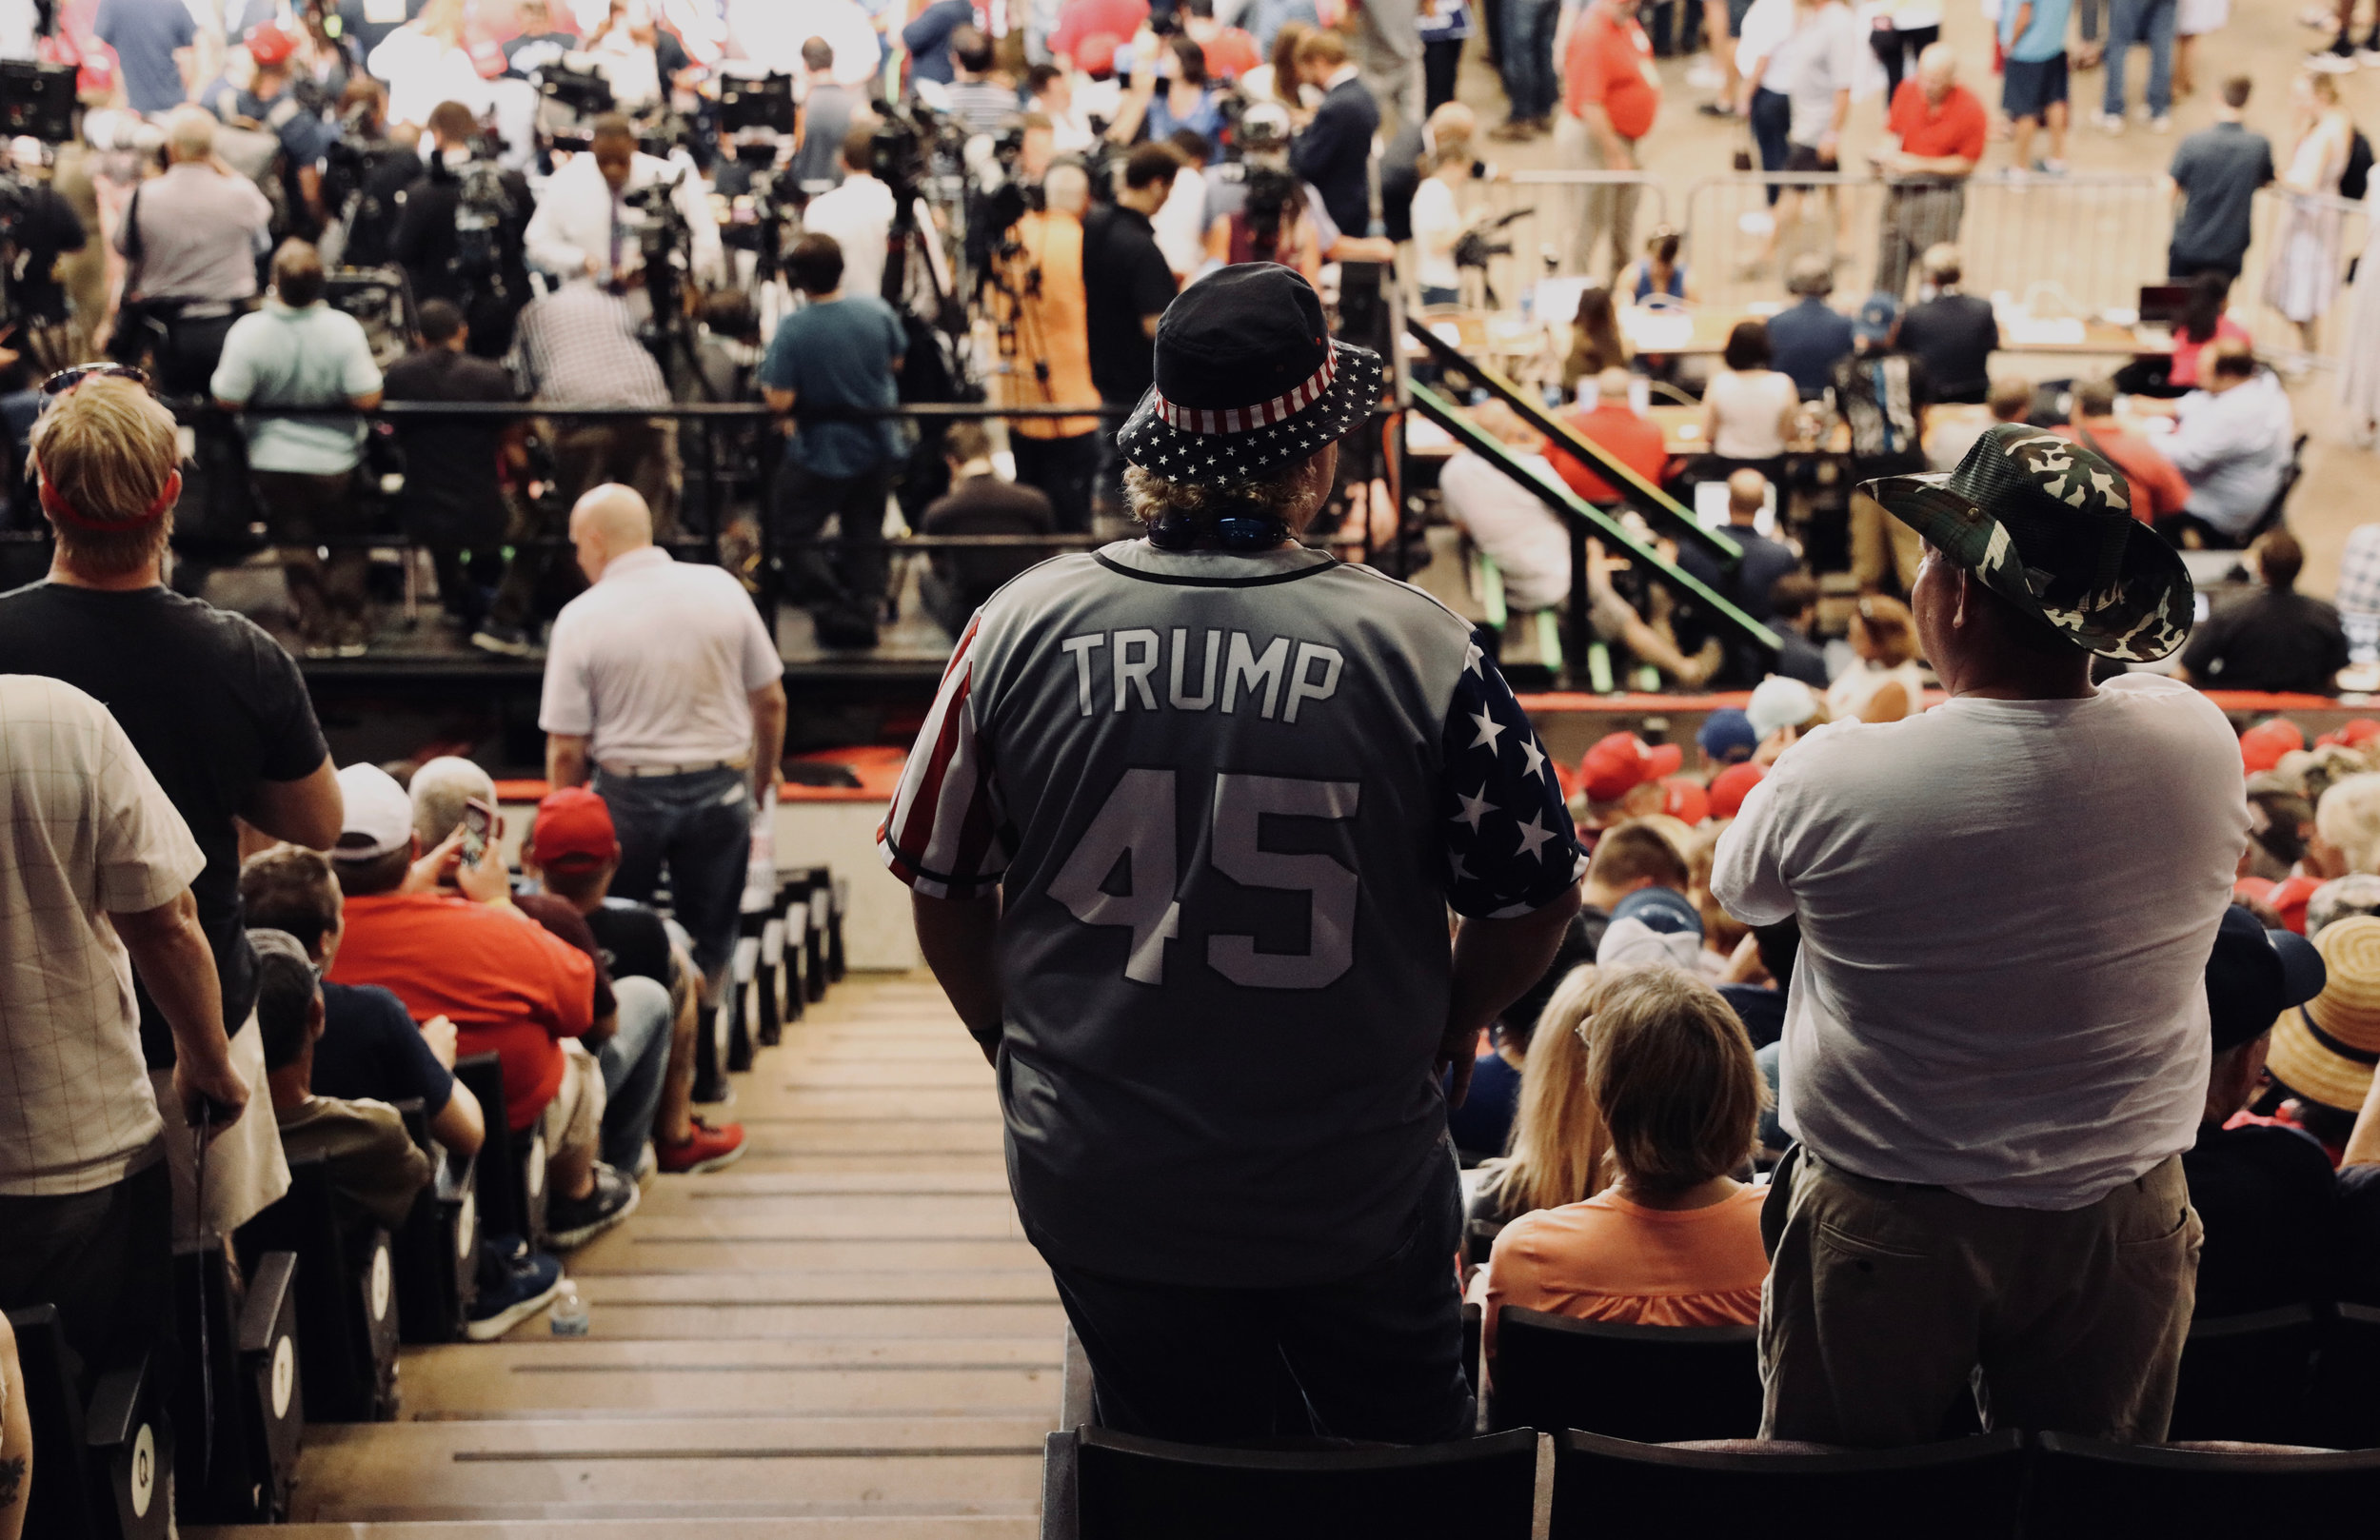 Andy Grant - Trump Rally 8.1.1940.jpg